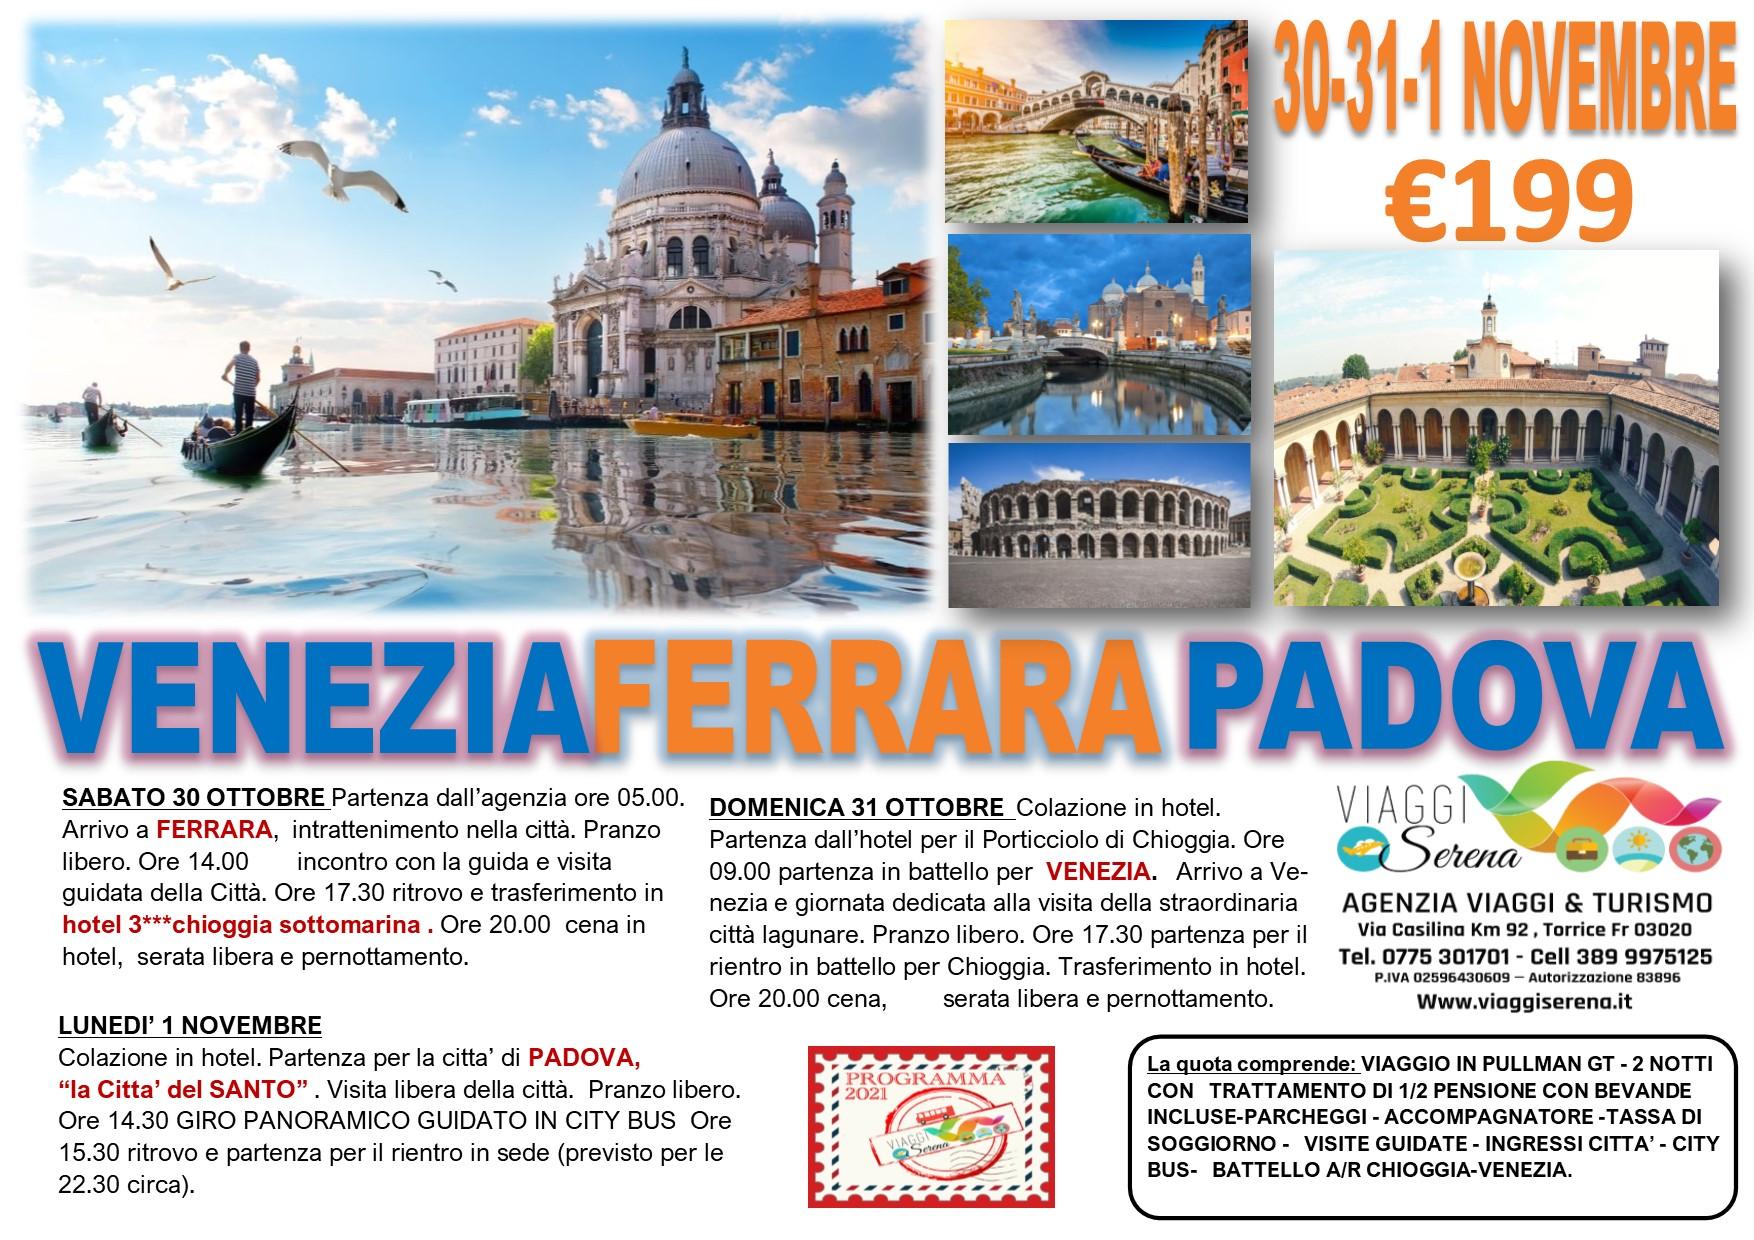 Viaggi di Gruppo: Ferrara, Venezia & Padova 30-31 Ottobre & 1 Novembre € 199,00